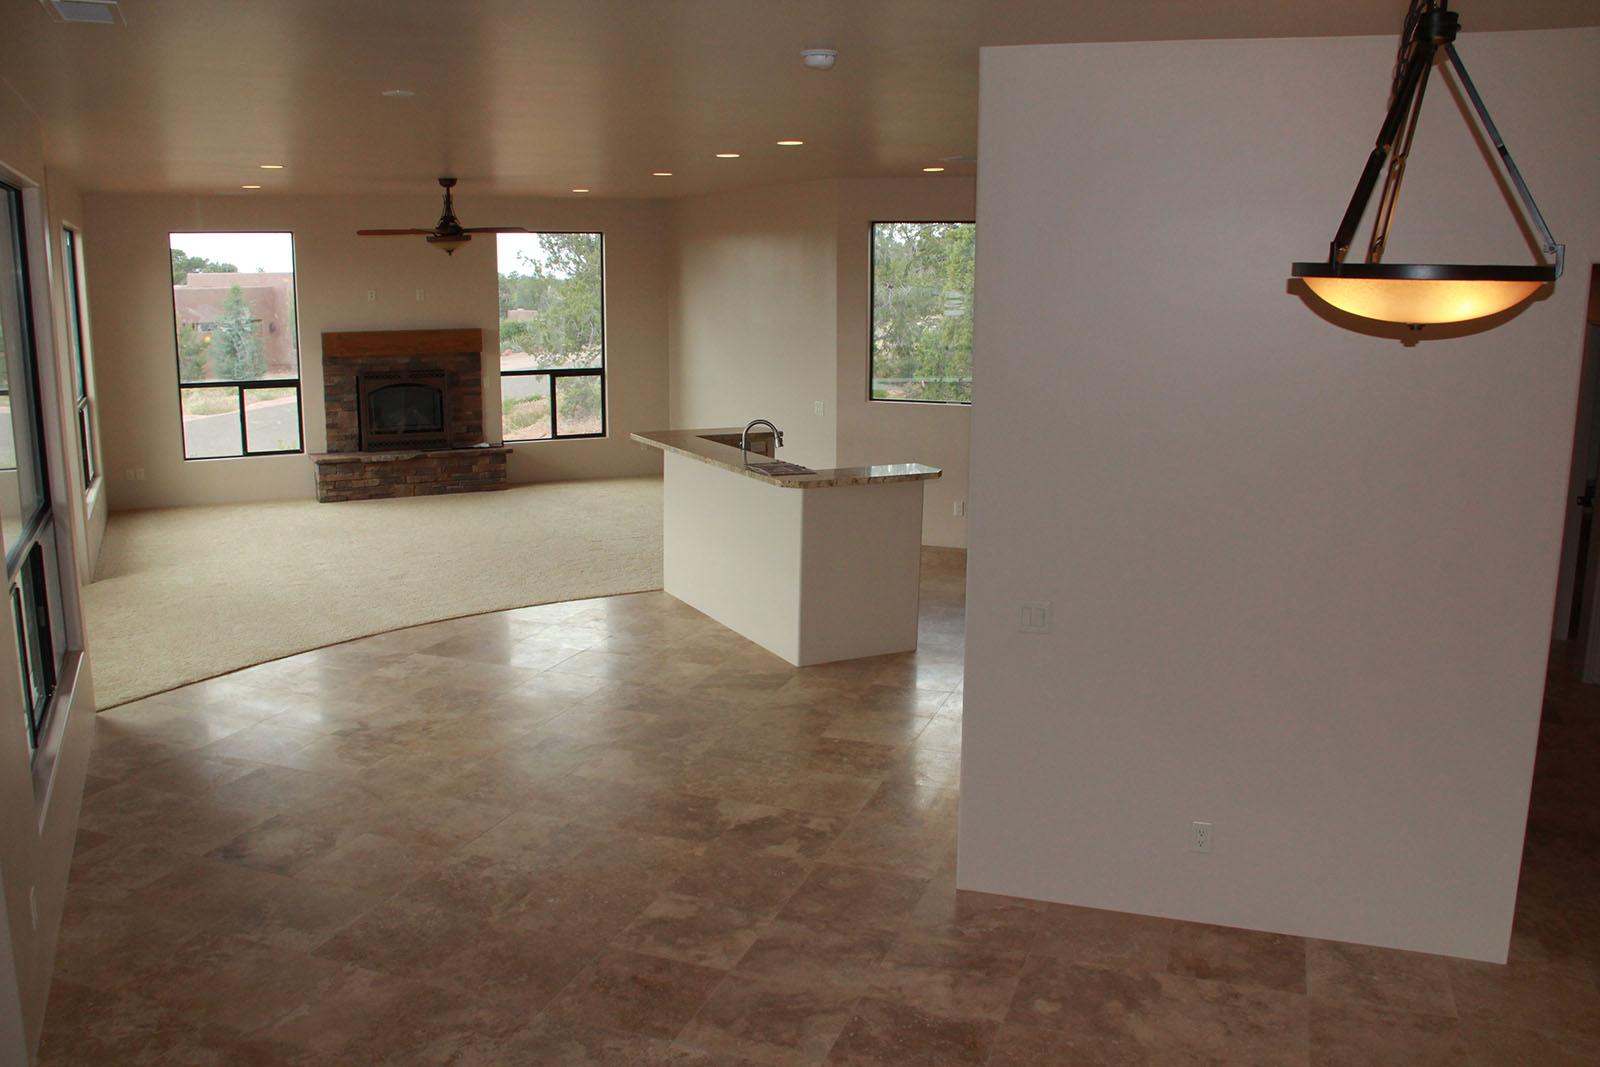 530-windsong-torel-custom-homes-sedona-arizona-0153-jpg